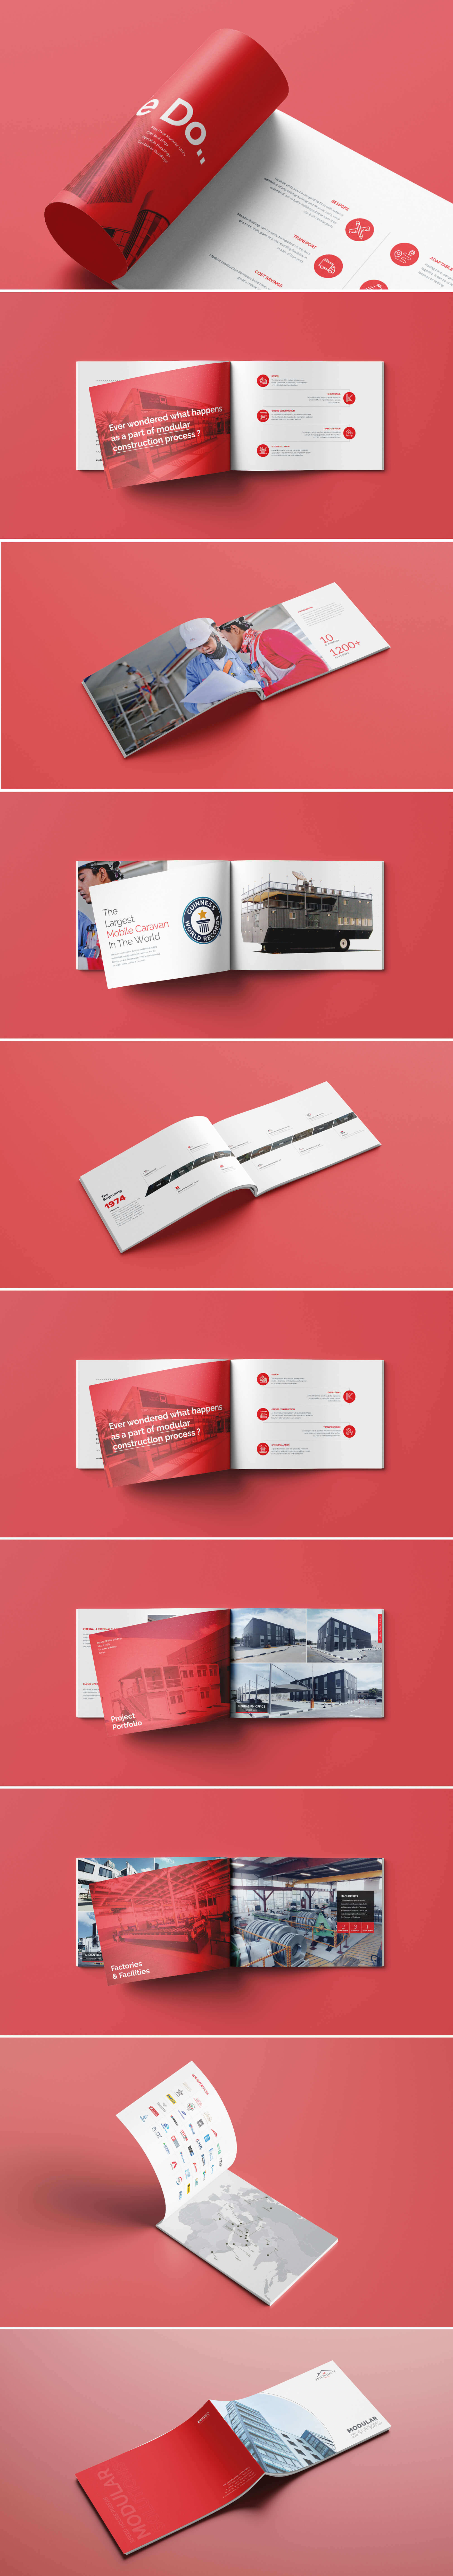 Modular Brochure design By Freelance Graphic Designer SAJID SULAIMAN